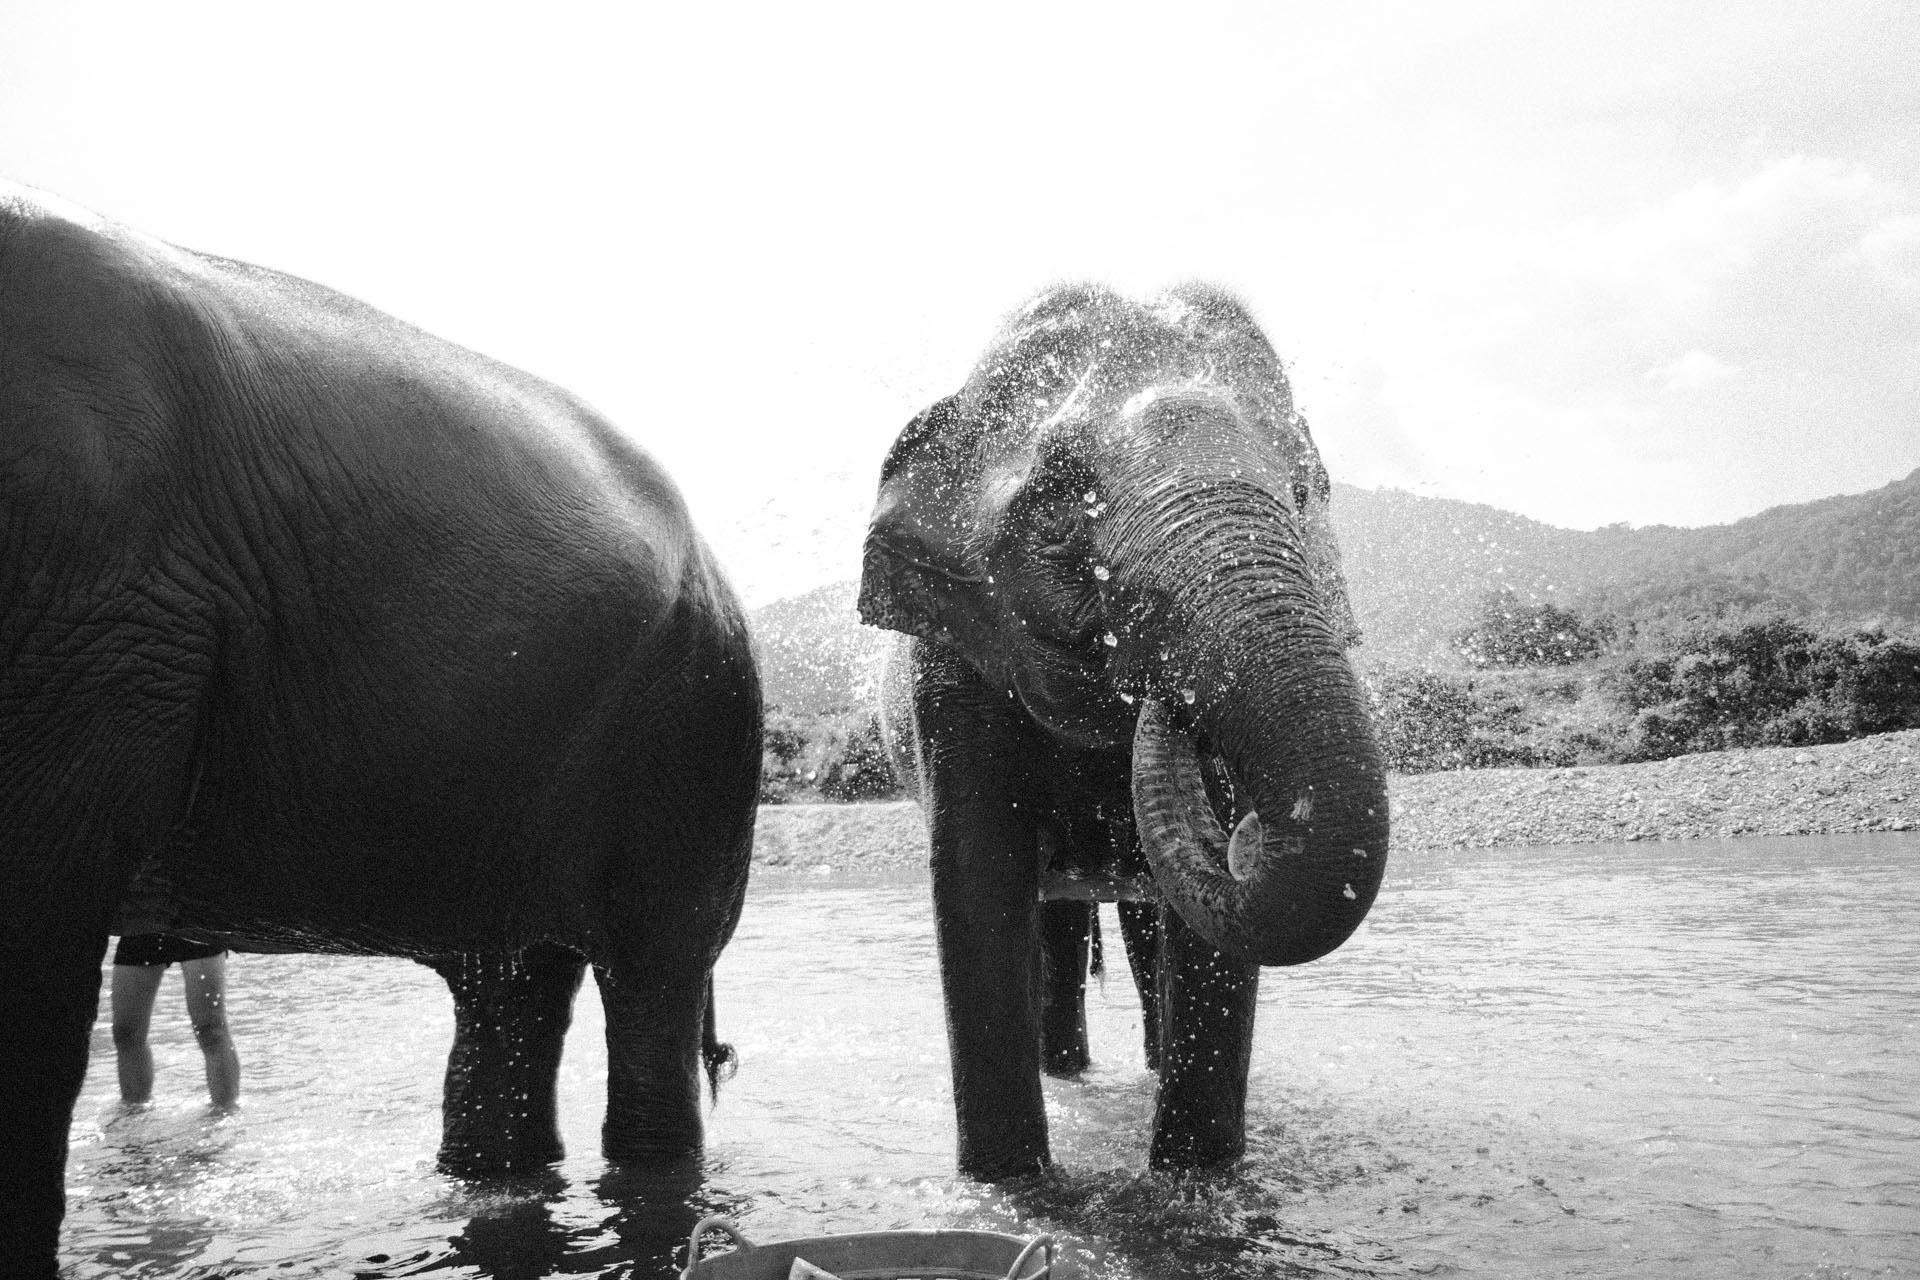 Ren Photography_Elephants_001.jpg